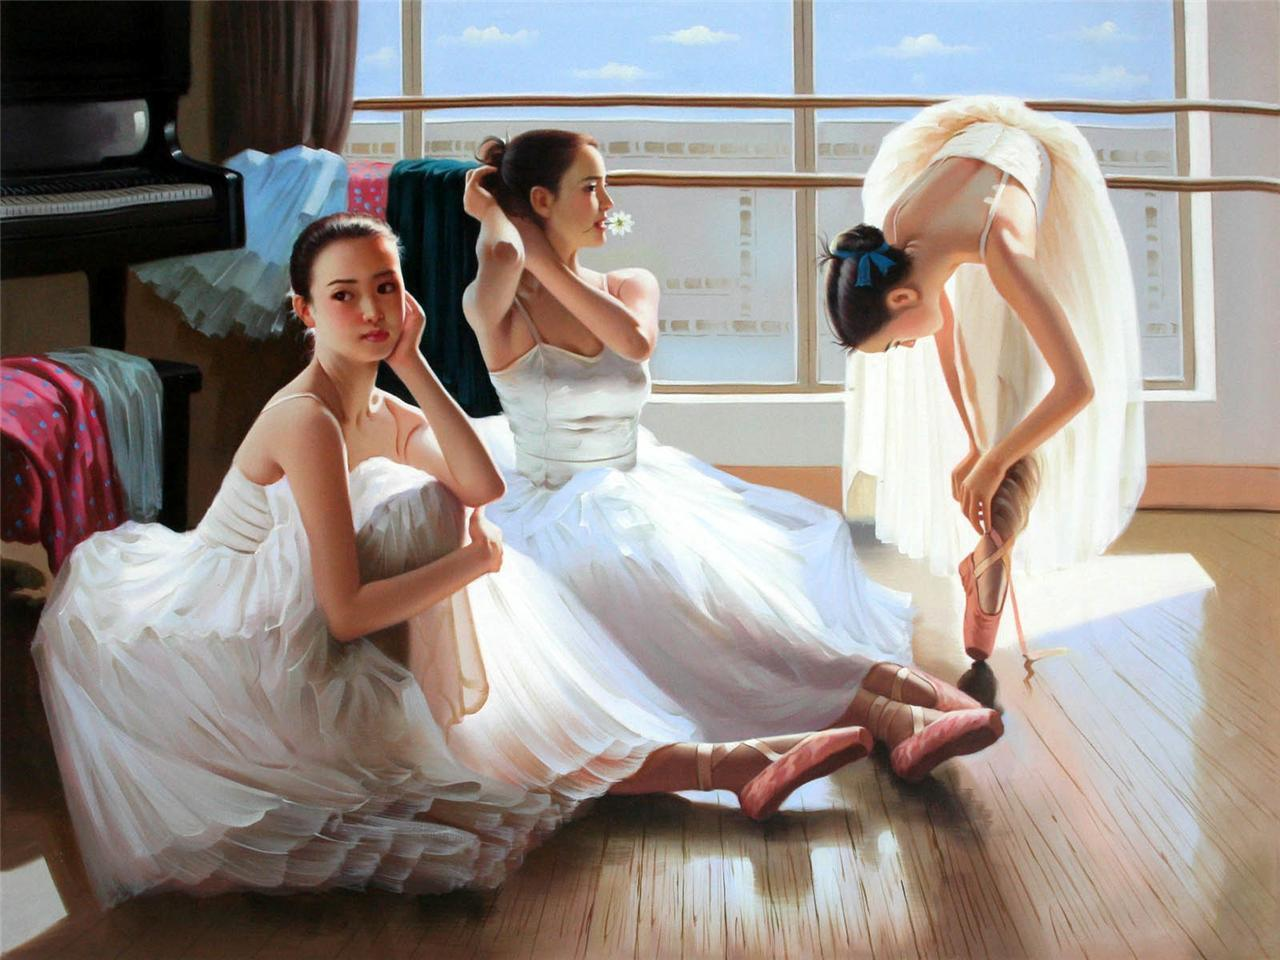 http://img.auctiva.com/imgdata/8/8/1/5/9/2/webimg/690423955_o.jpg